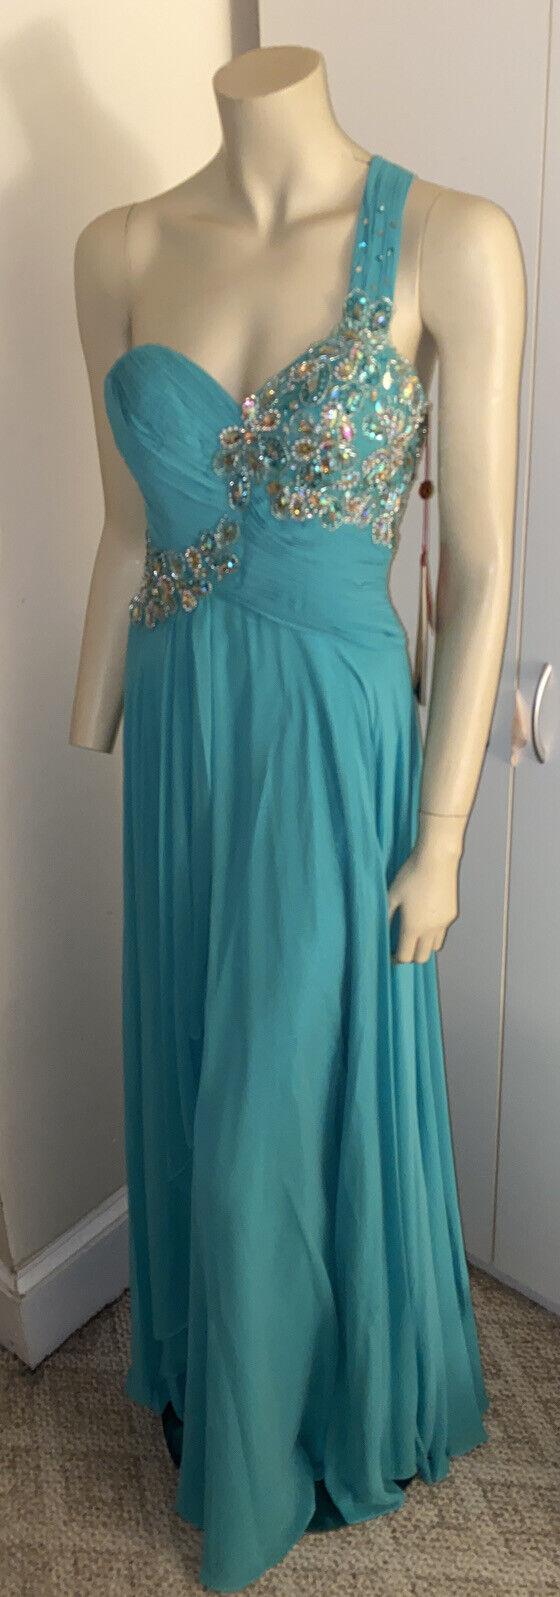 May Queen Couture USA One Shoulder Chiffon Dress, Mint, Size 4, MAQ-MQ1061